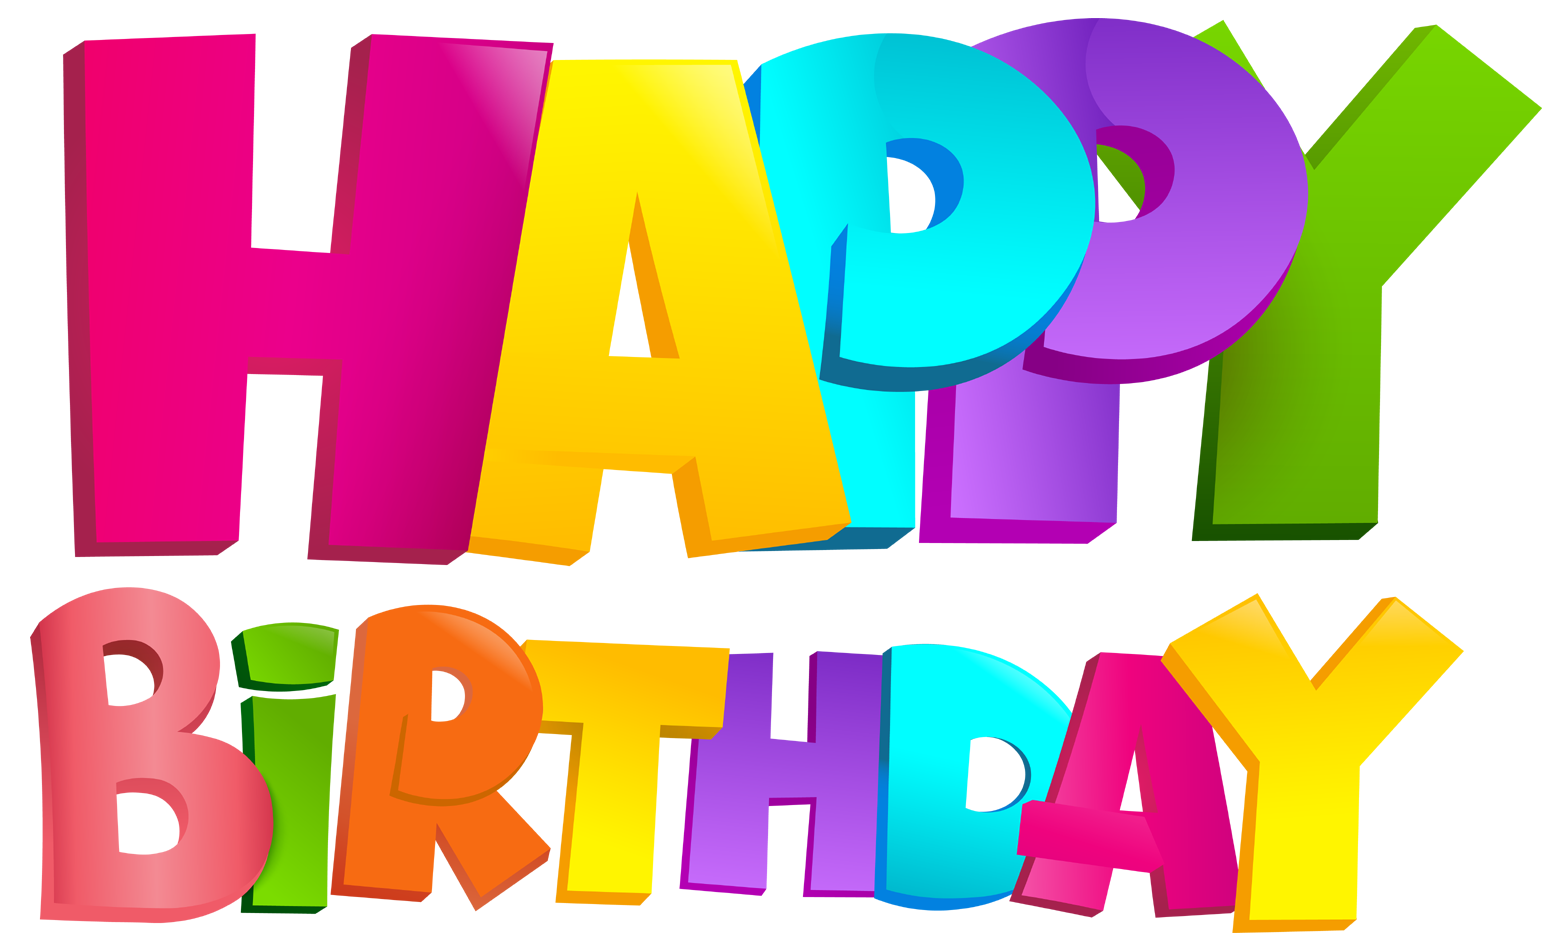 Happy birthday logos clipart jpg transparent download Happy Birthday PNG Images Transparent Free Download   PNGMart.com jpg transparent download